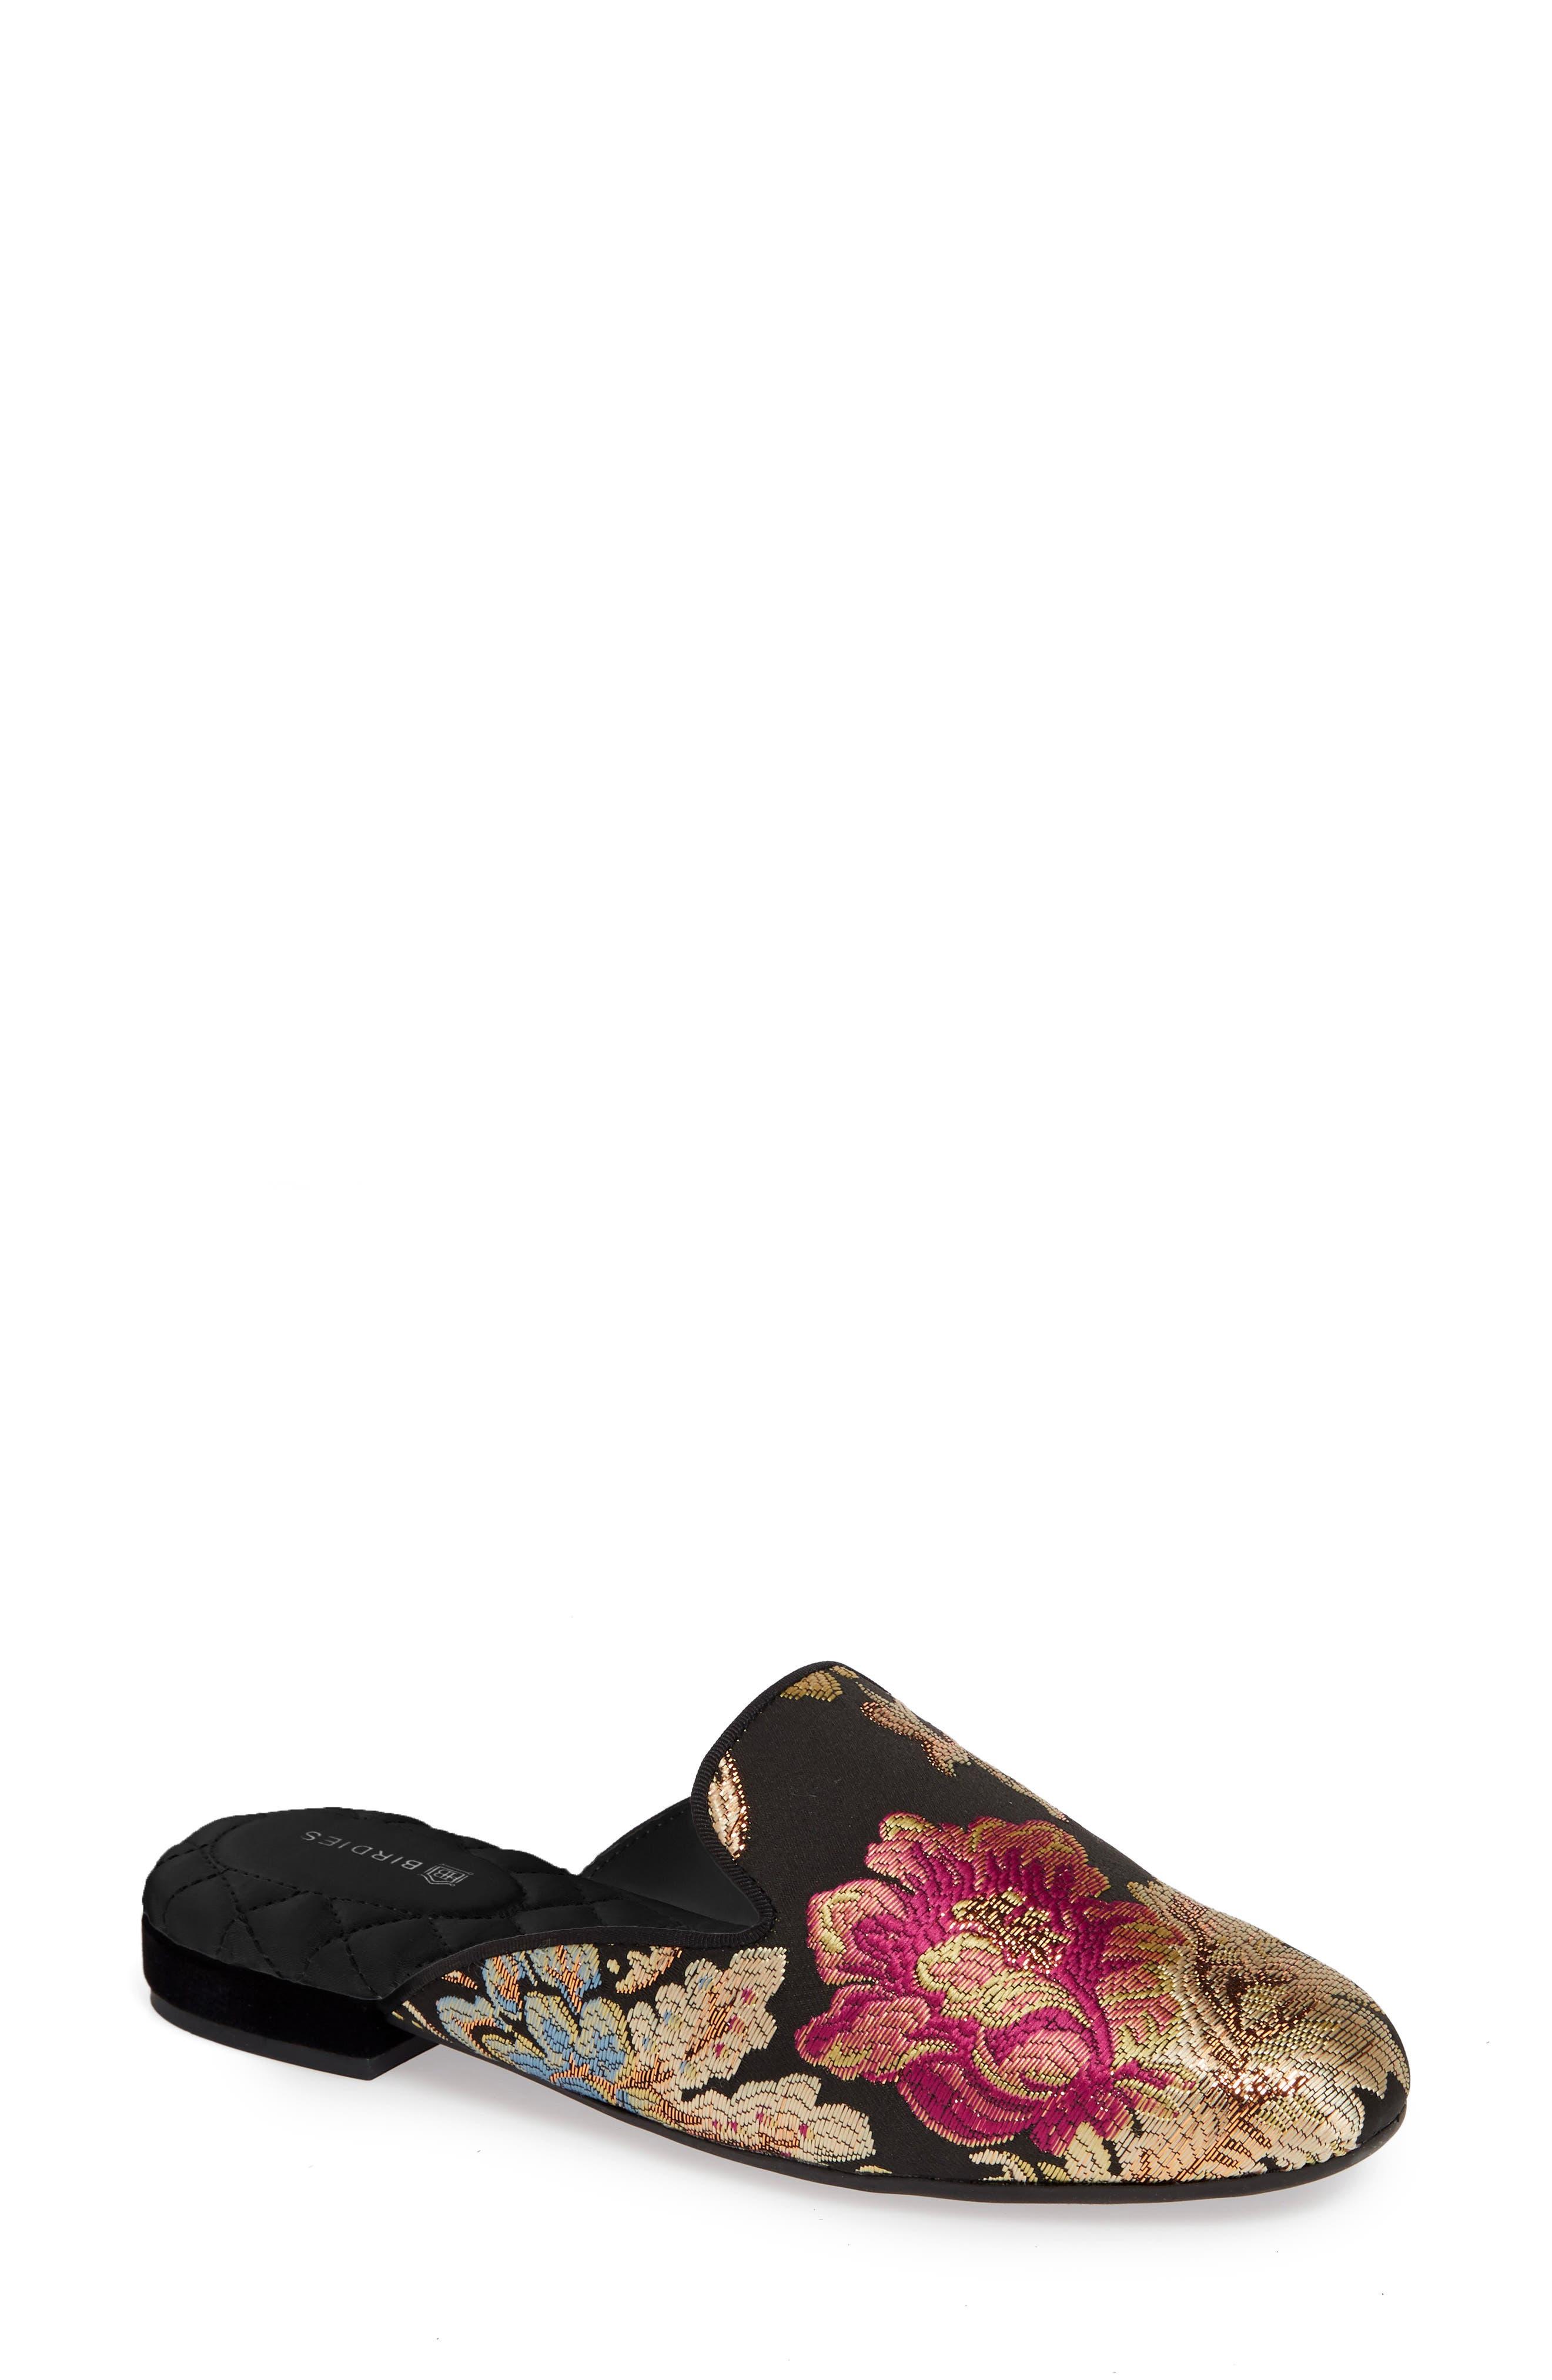 BIRDIES, Phoebe Slipper, Main thumbnail 1, color, FLORAL JACQUARD SATIN